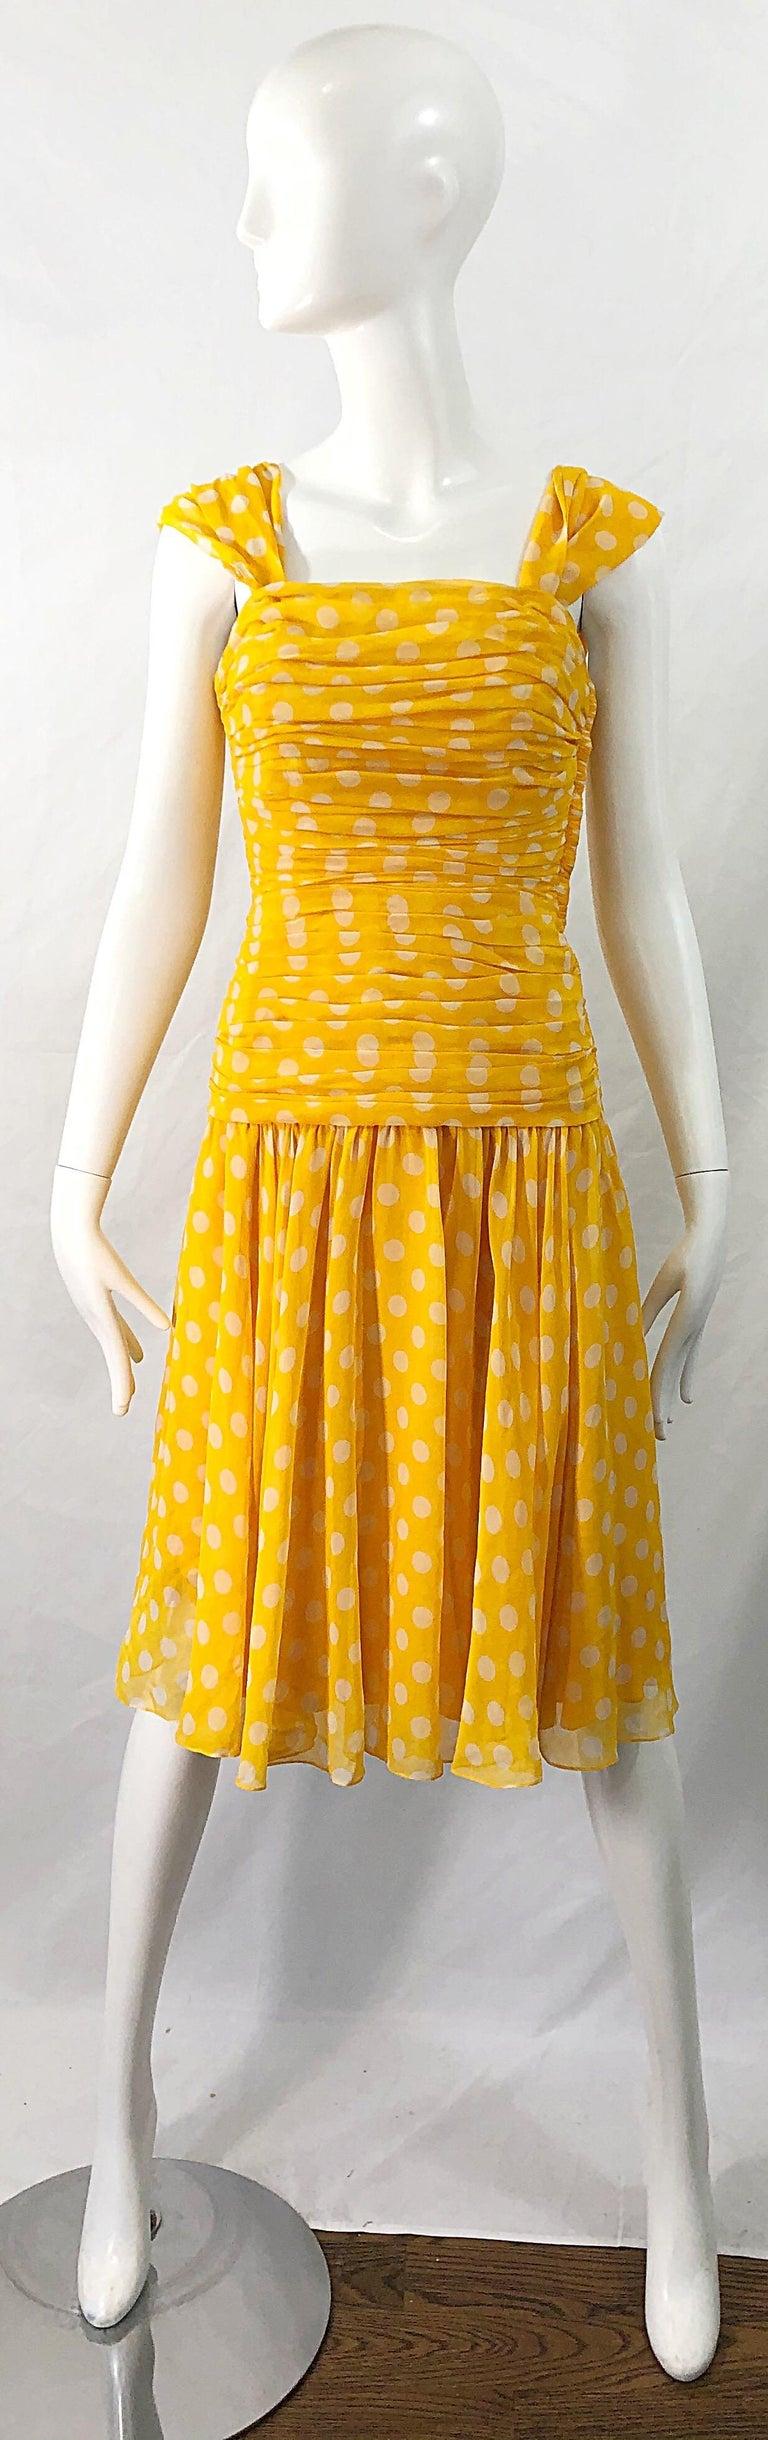 Adele Simpson 1980s Size 4 Yellow White Silk Chiffon Polka Dot Vintage 80s Dress For Sale 9